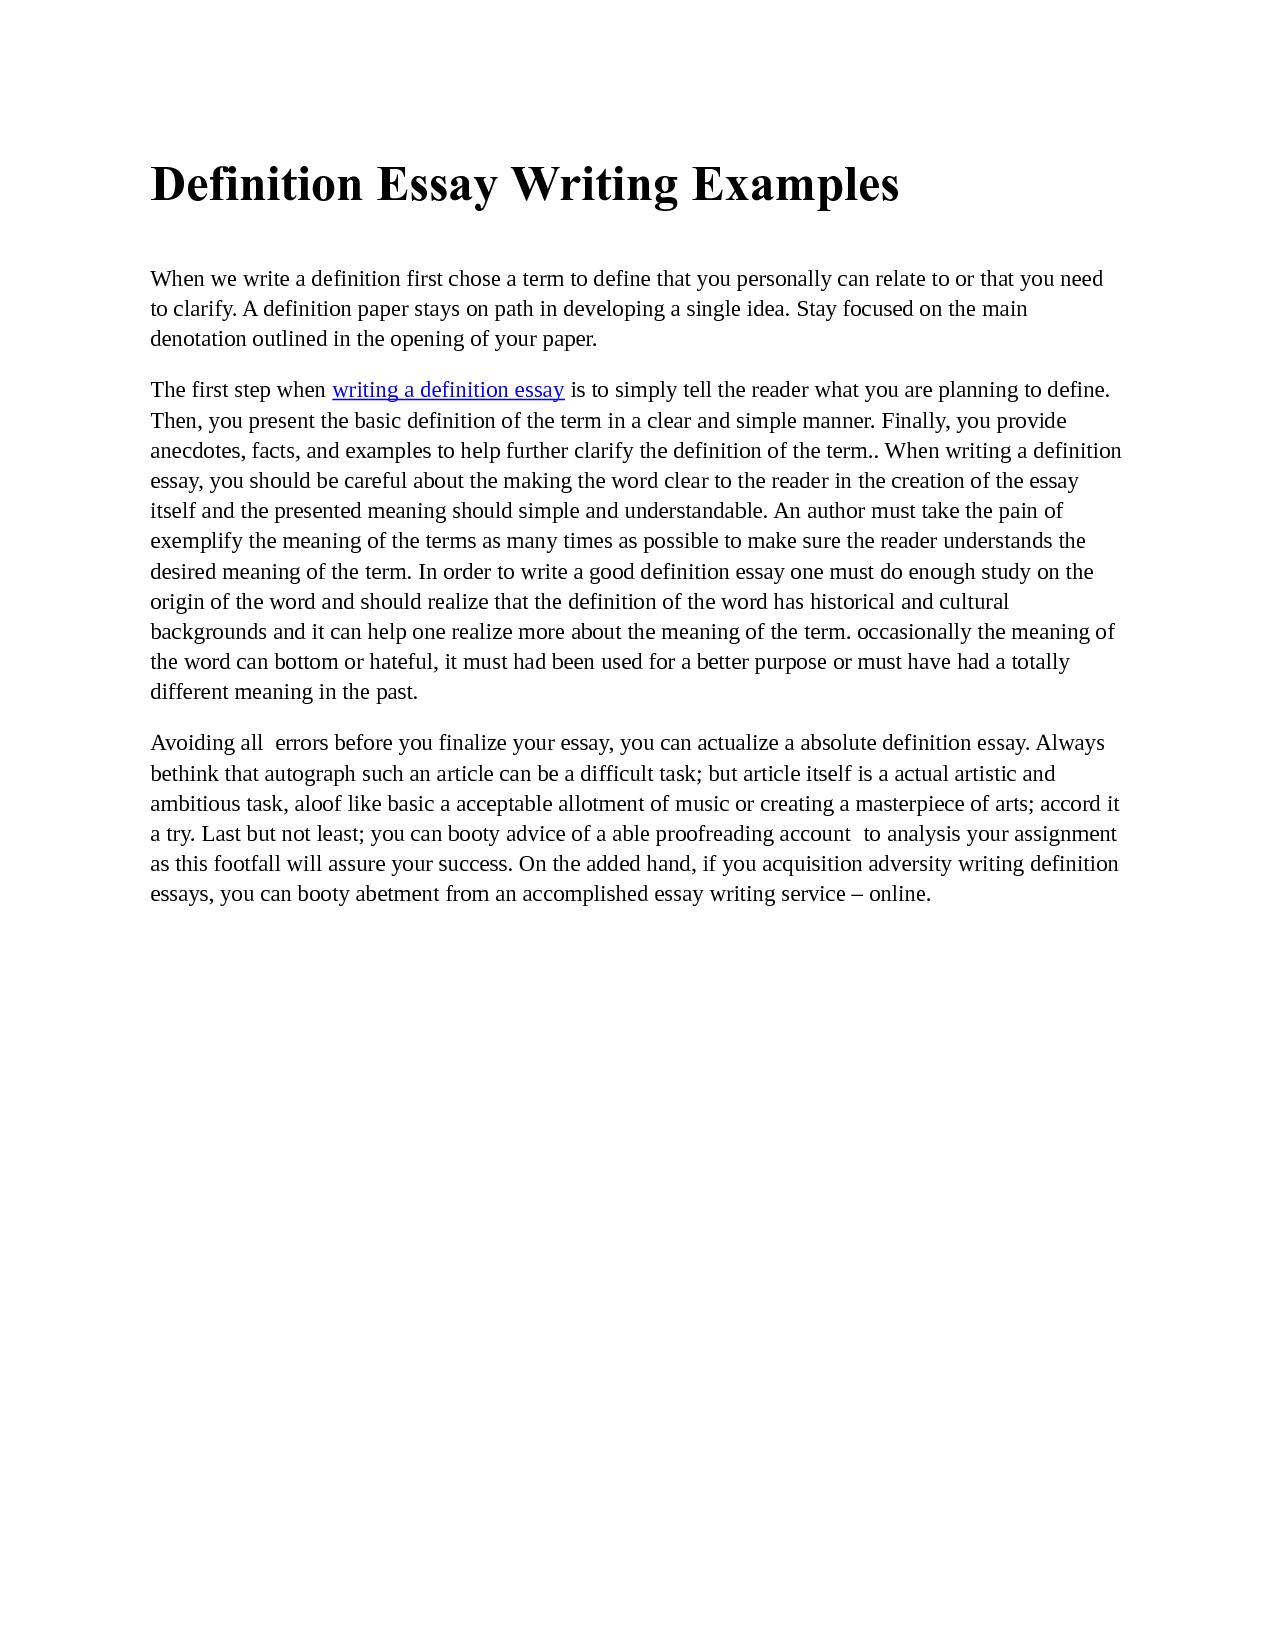 Writing about math elementary academy nj